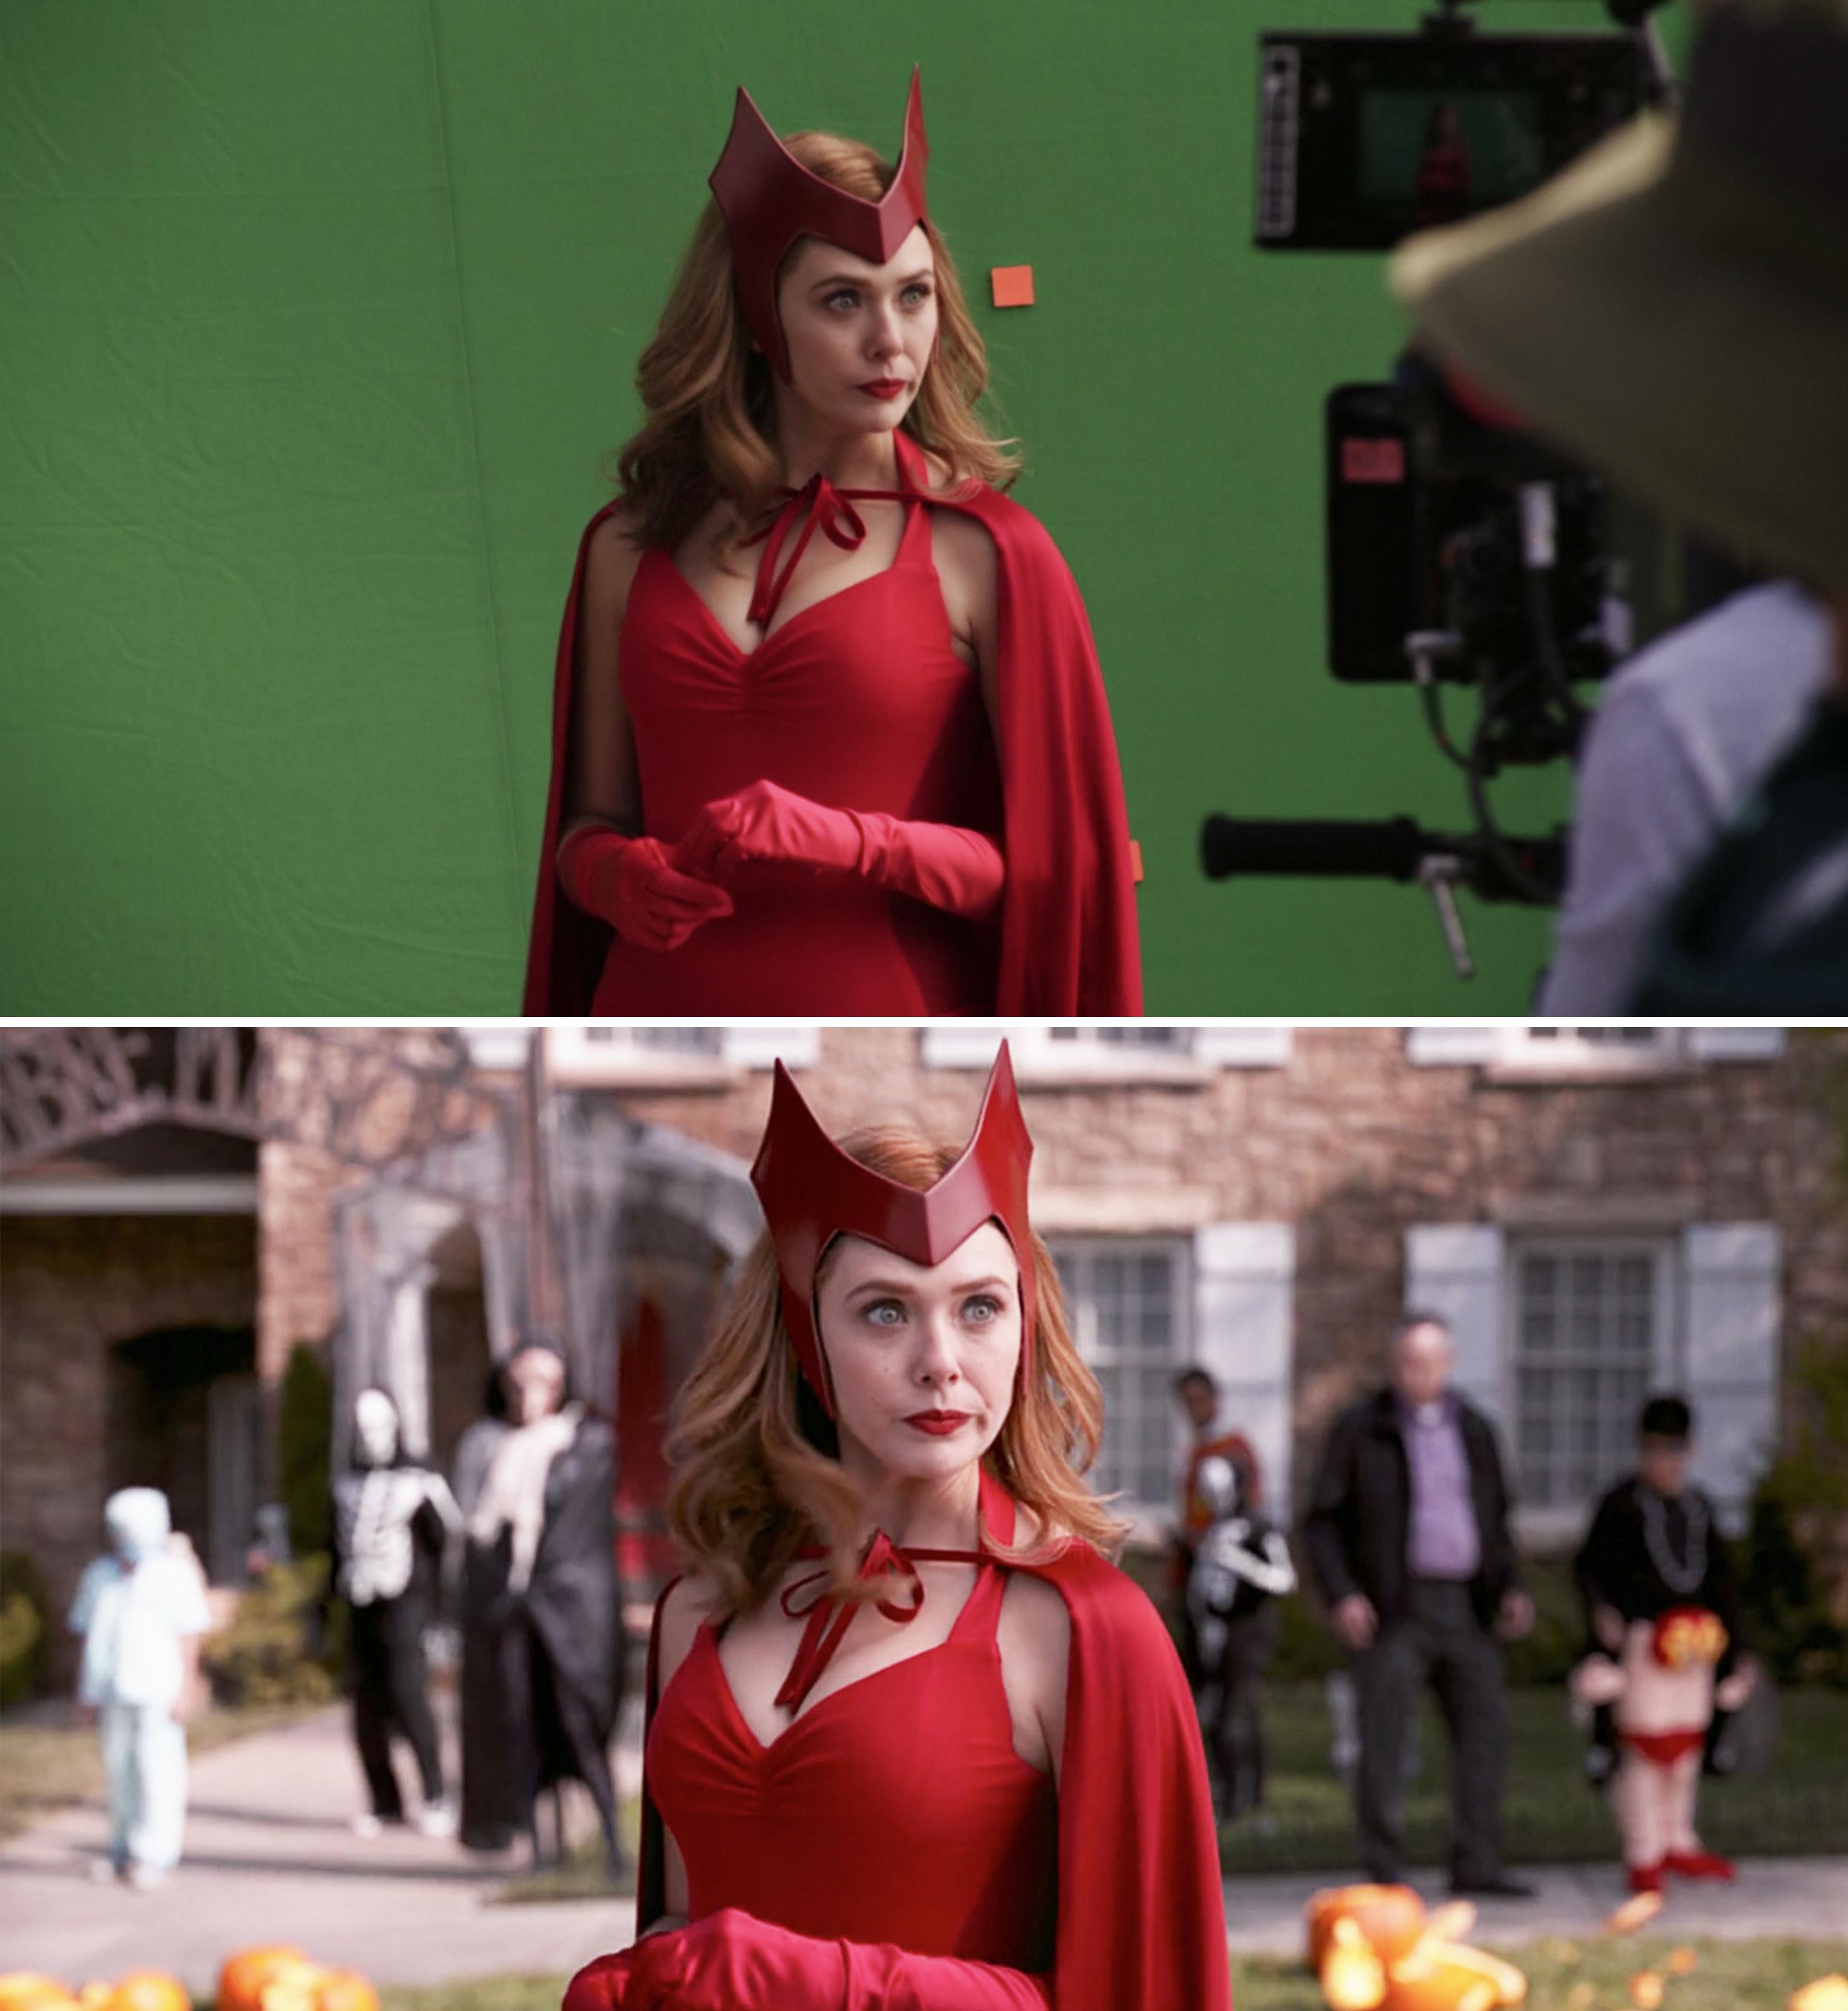 Elizabeth Olsen as Wanda in her Halloween costume filming on a green screen